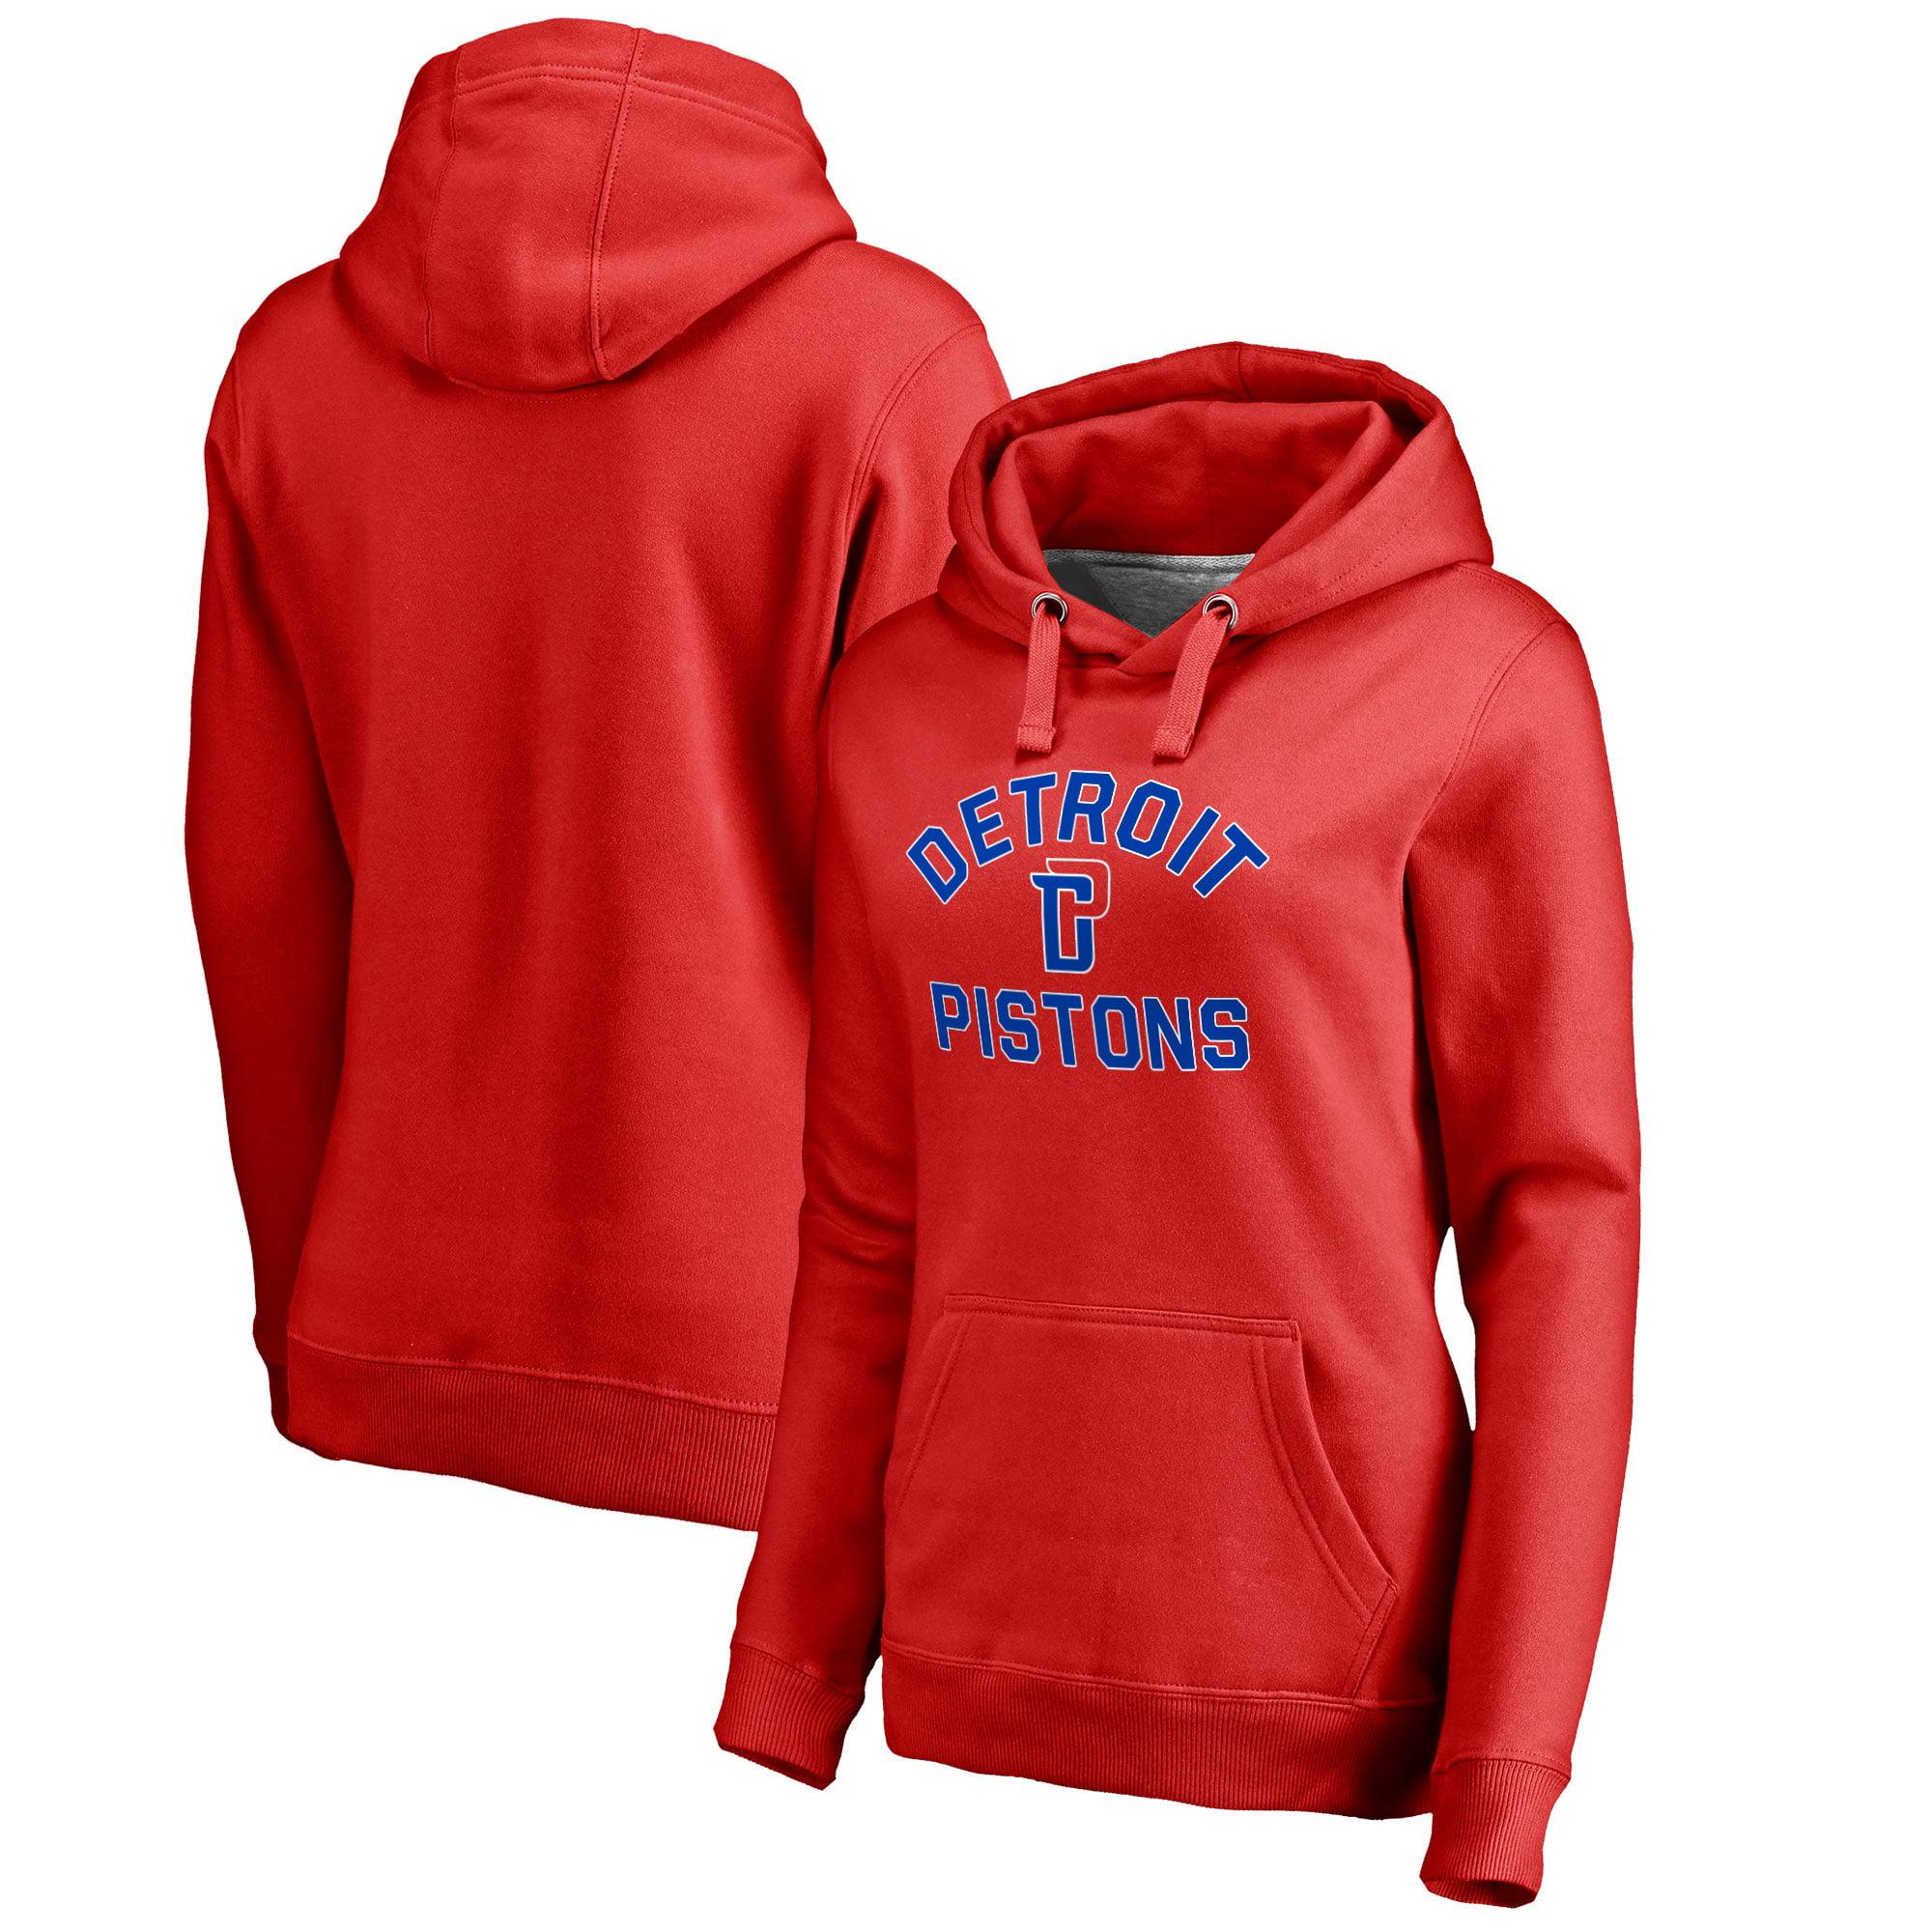 Detroit Pistons Fanatics Branded Women's Overtime Pullover Hoodie - Red